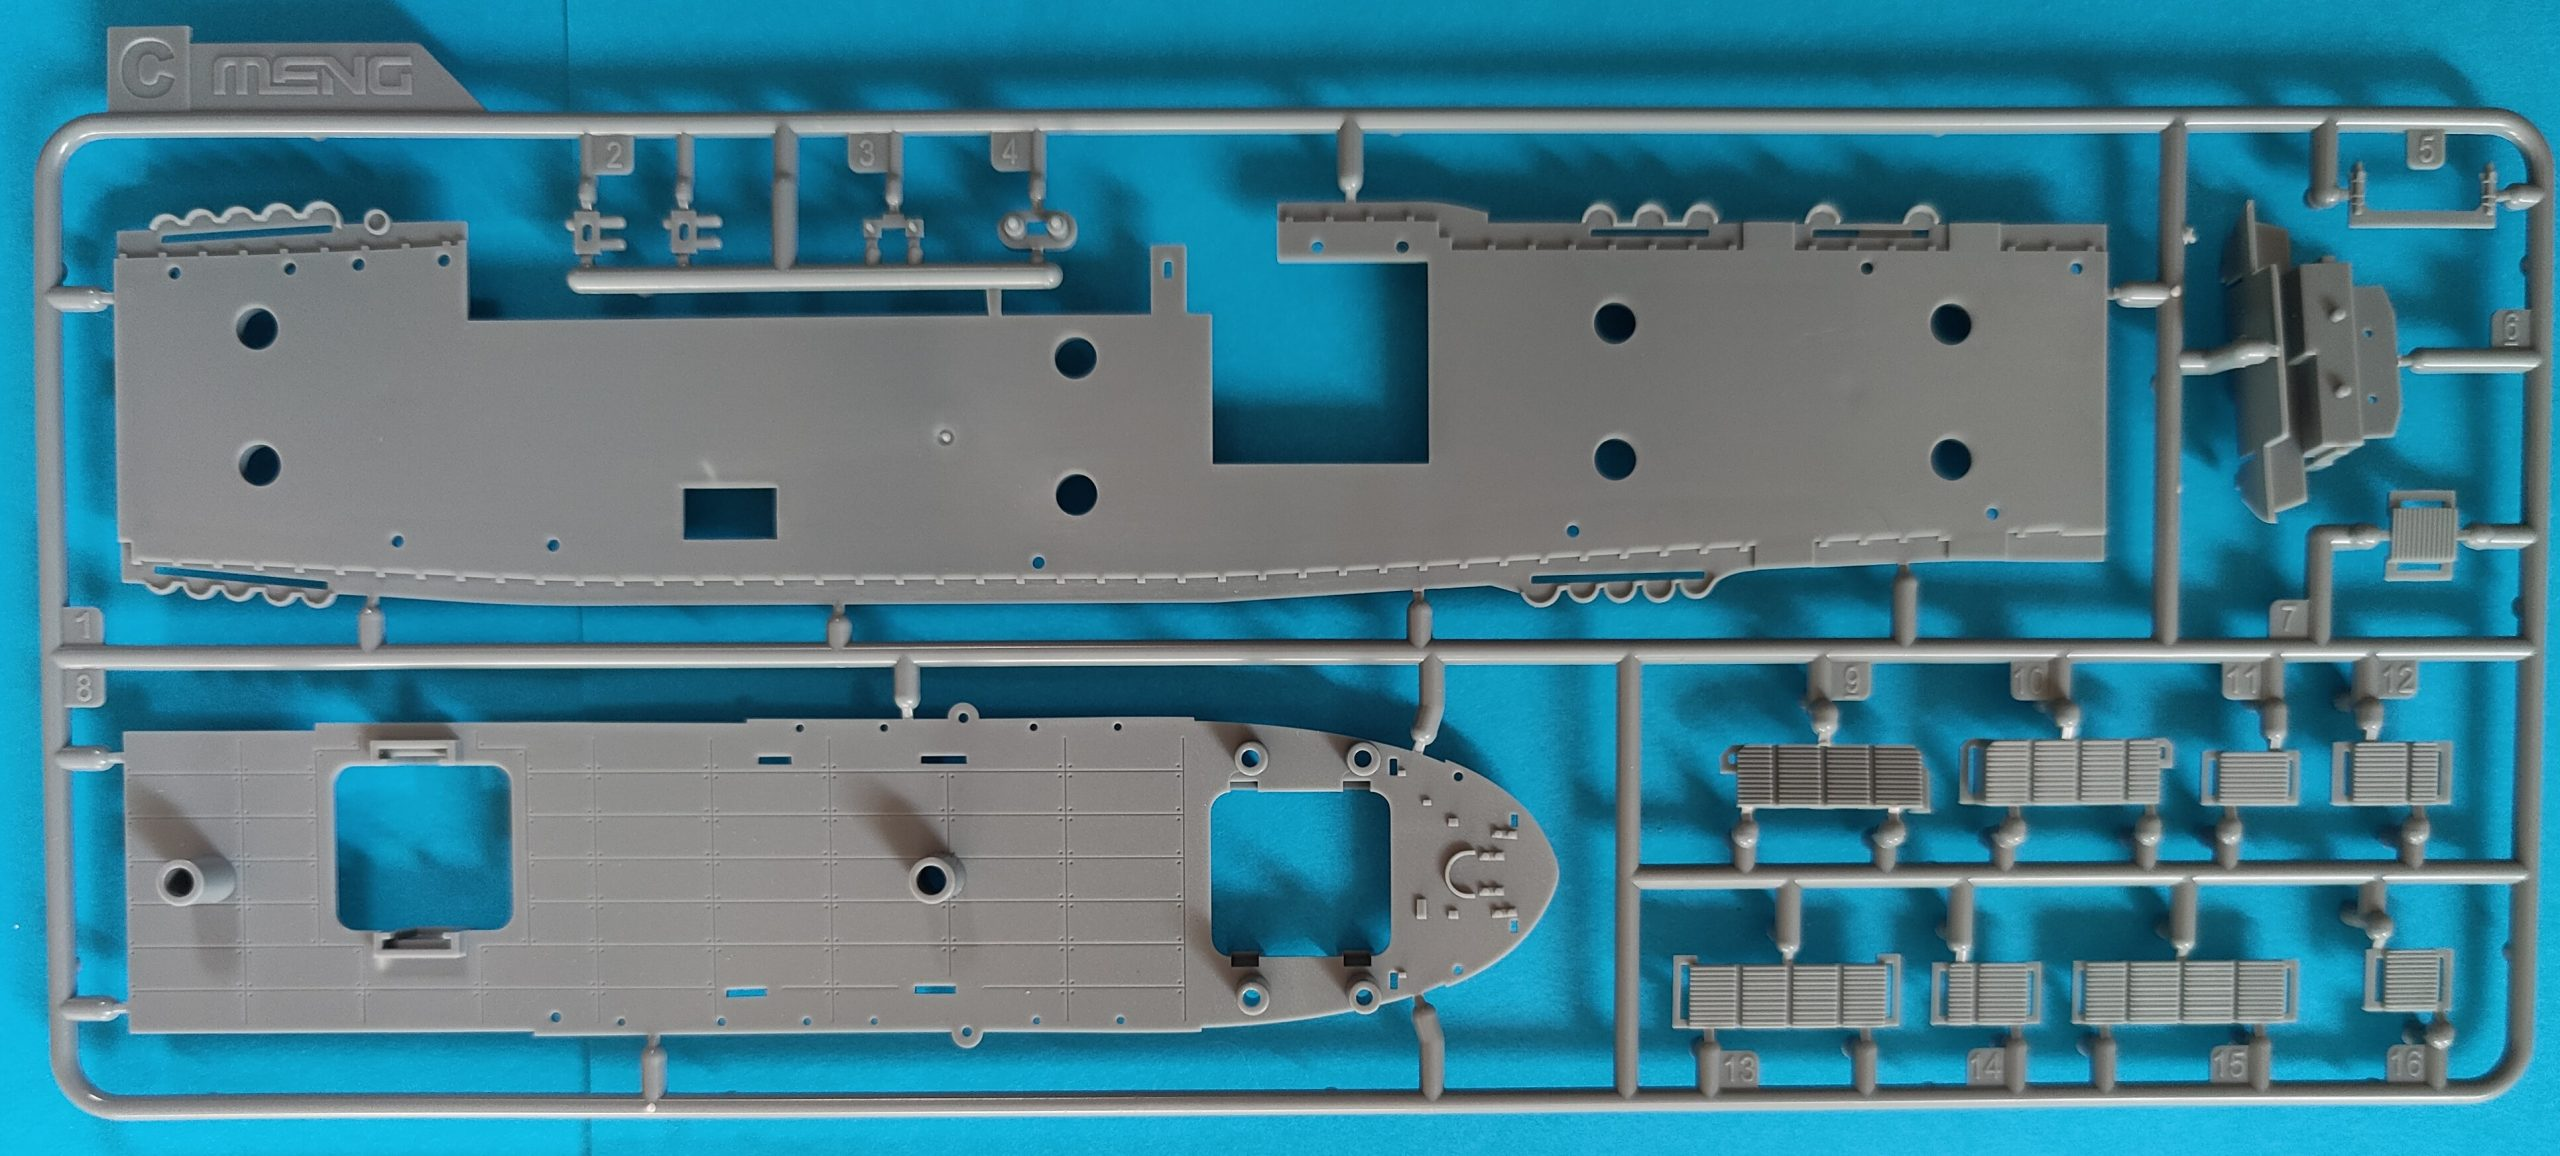 meng_enterprise006-scaled U.S. Navy aircraft carrier Enterprise (CV-6) in 1:700 von Meng